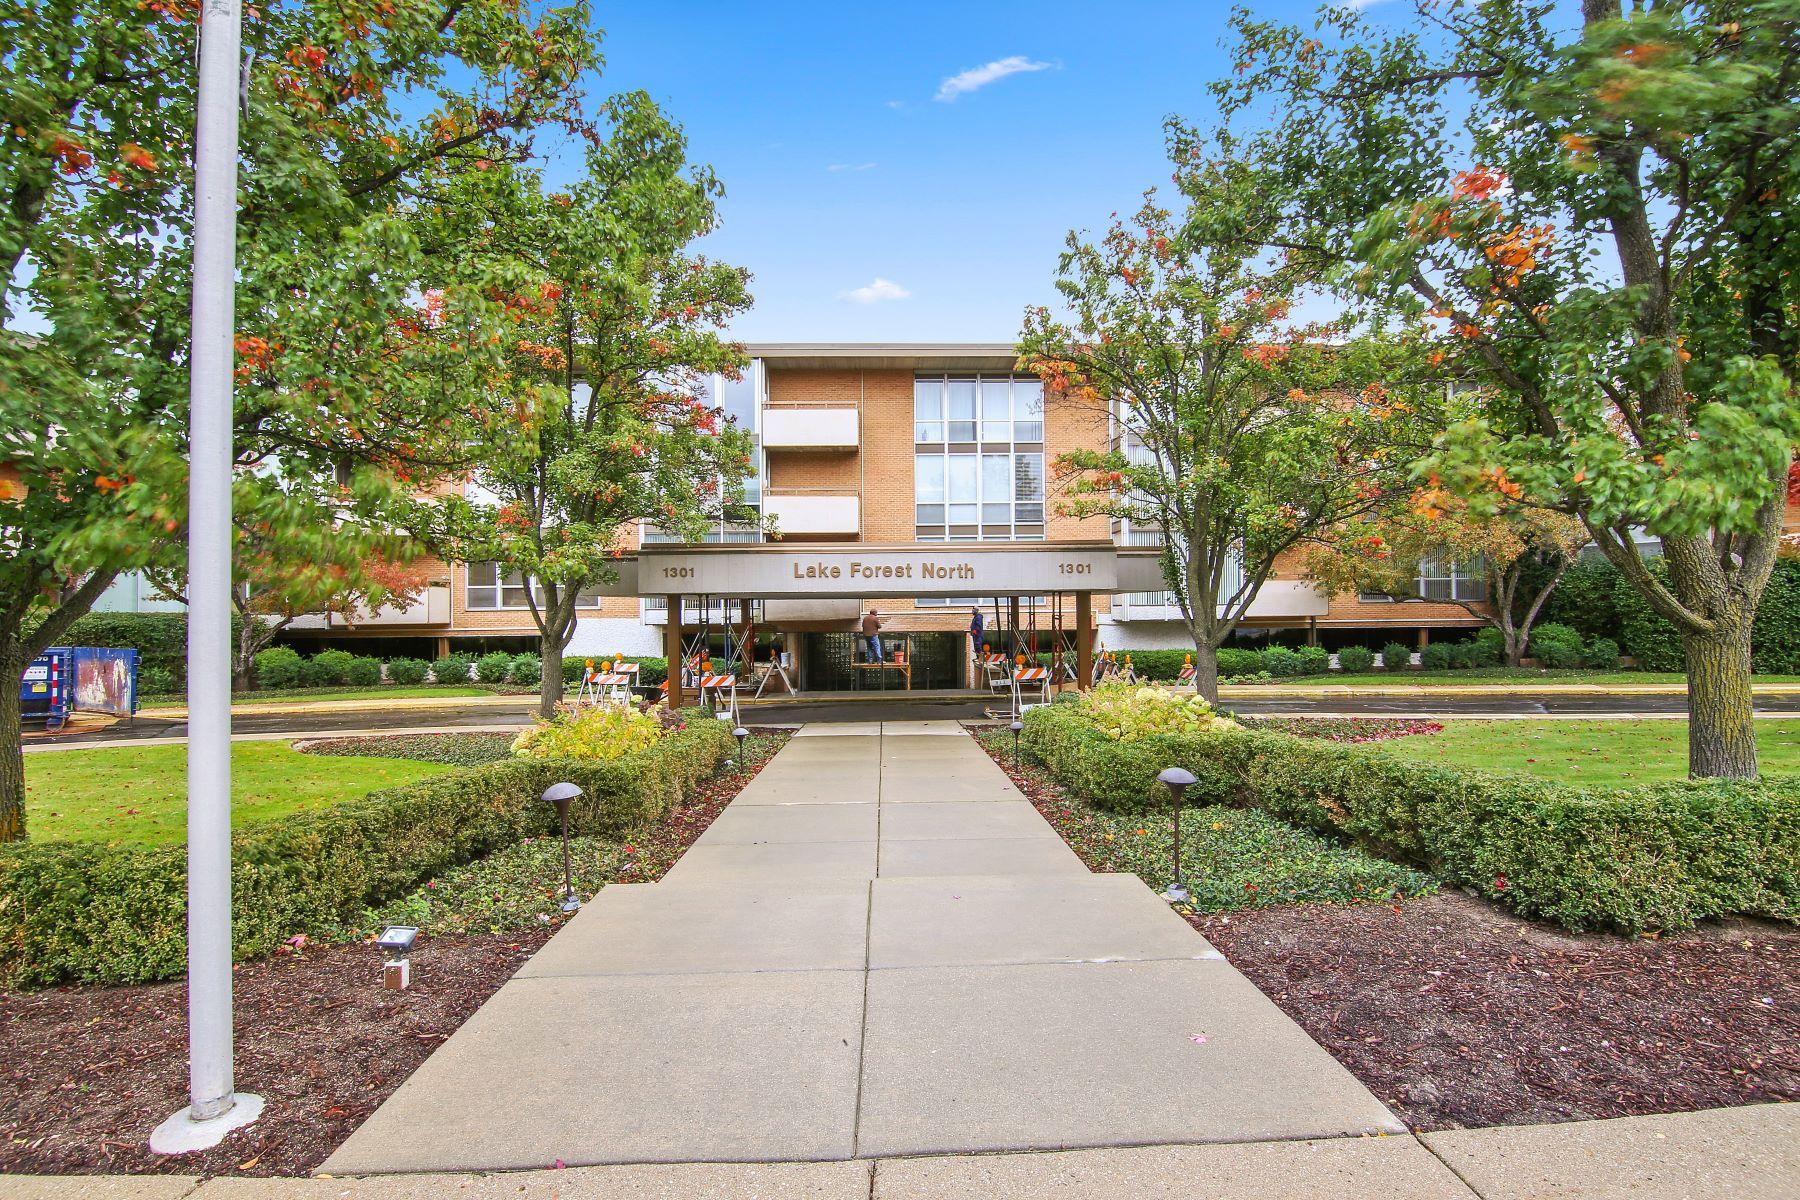 Condominiums للـ Sale في Spacious and Bright Condo 1301 N Western Avenue Unit 211, Lake Forest, Illinois 60045 United States